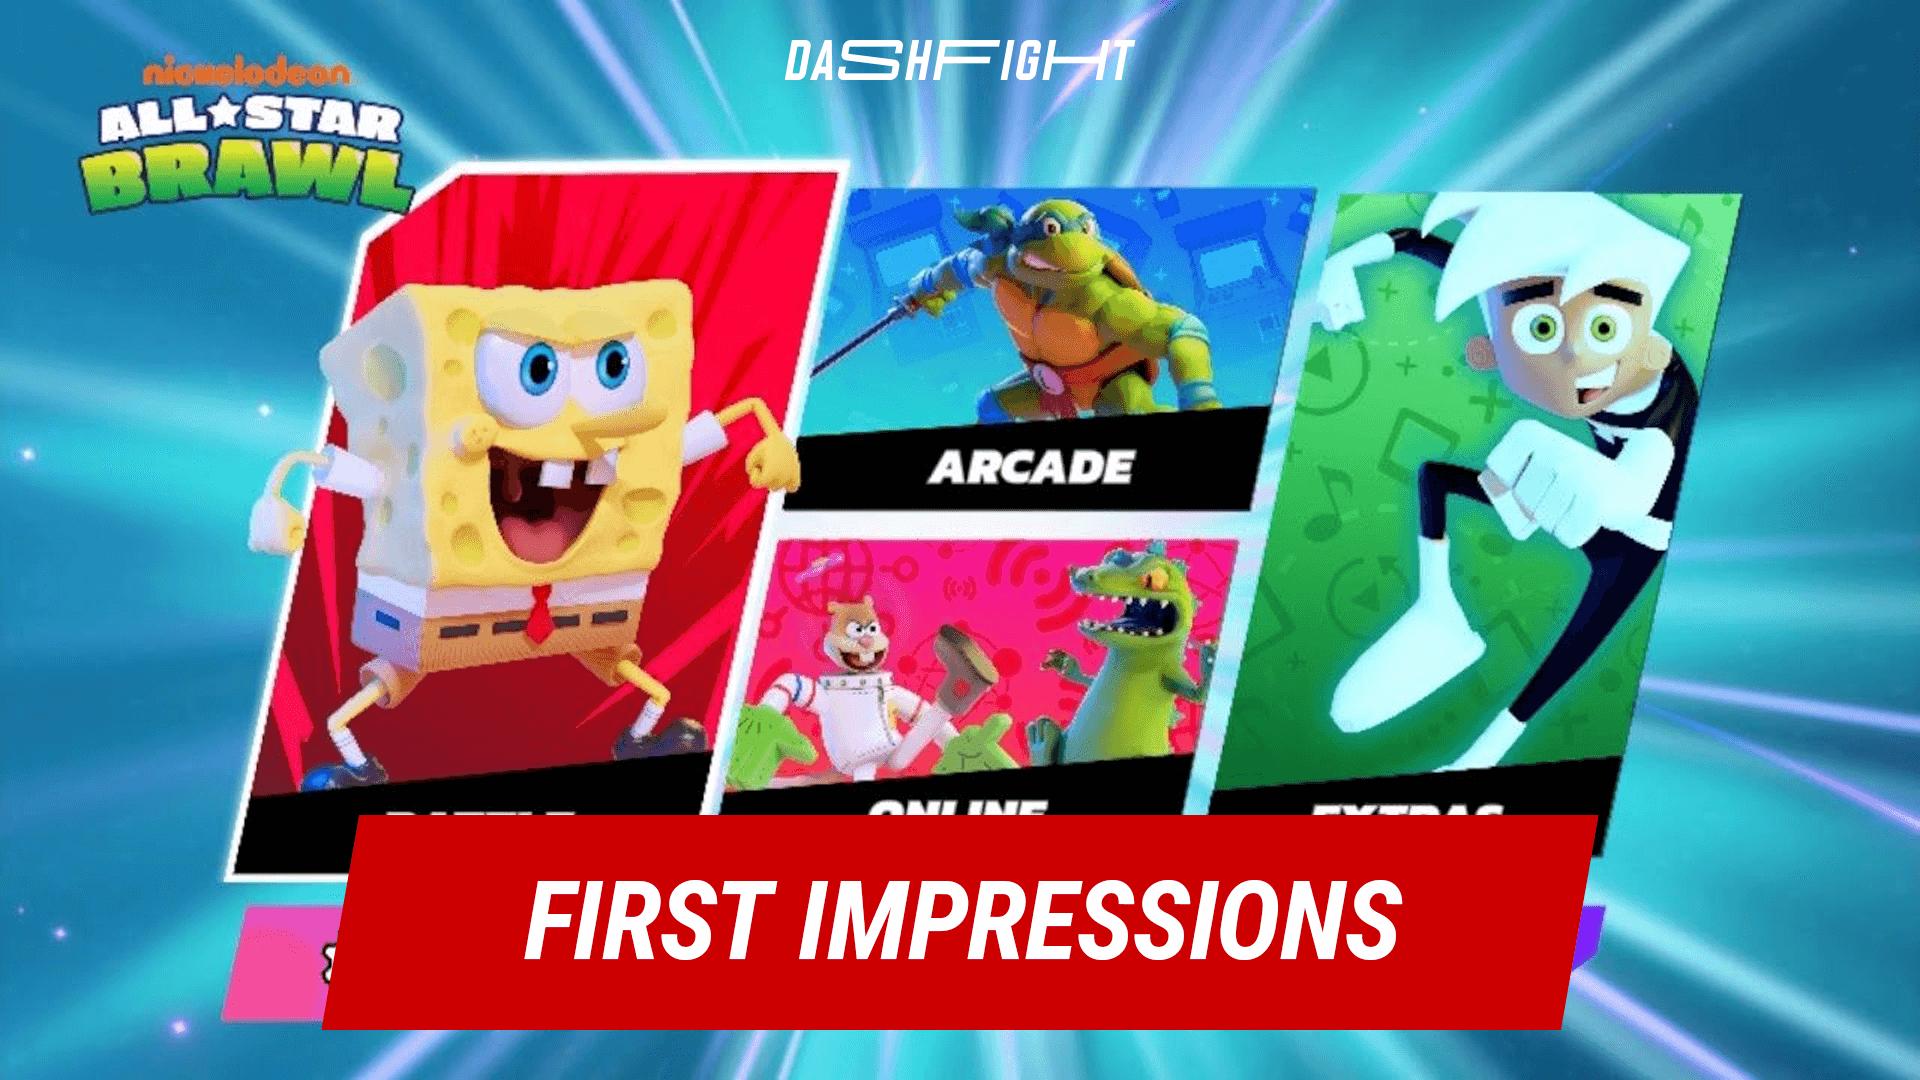 Nickelodeon All-Star Brawl: First Impressions